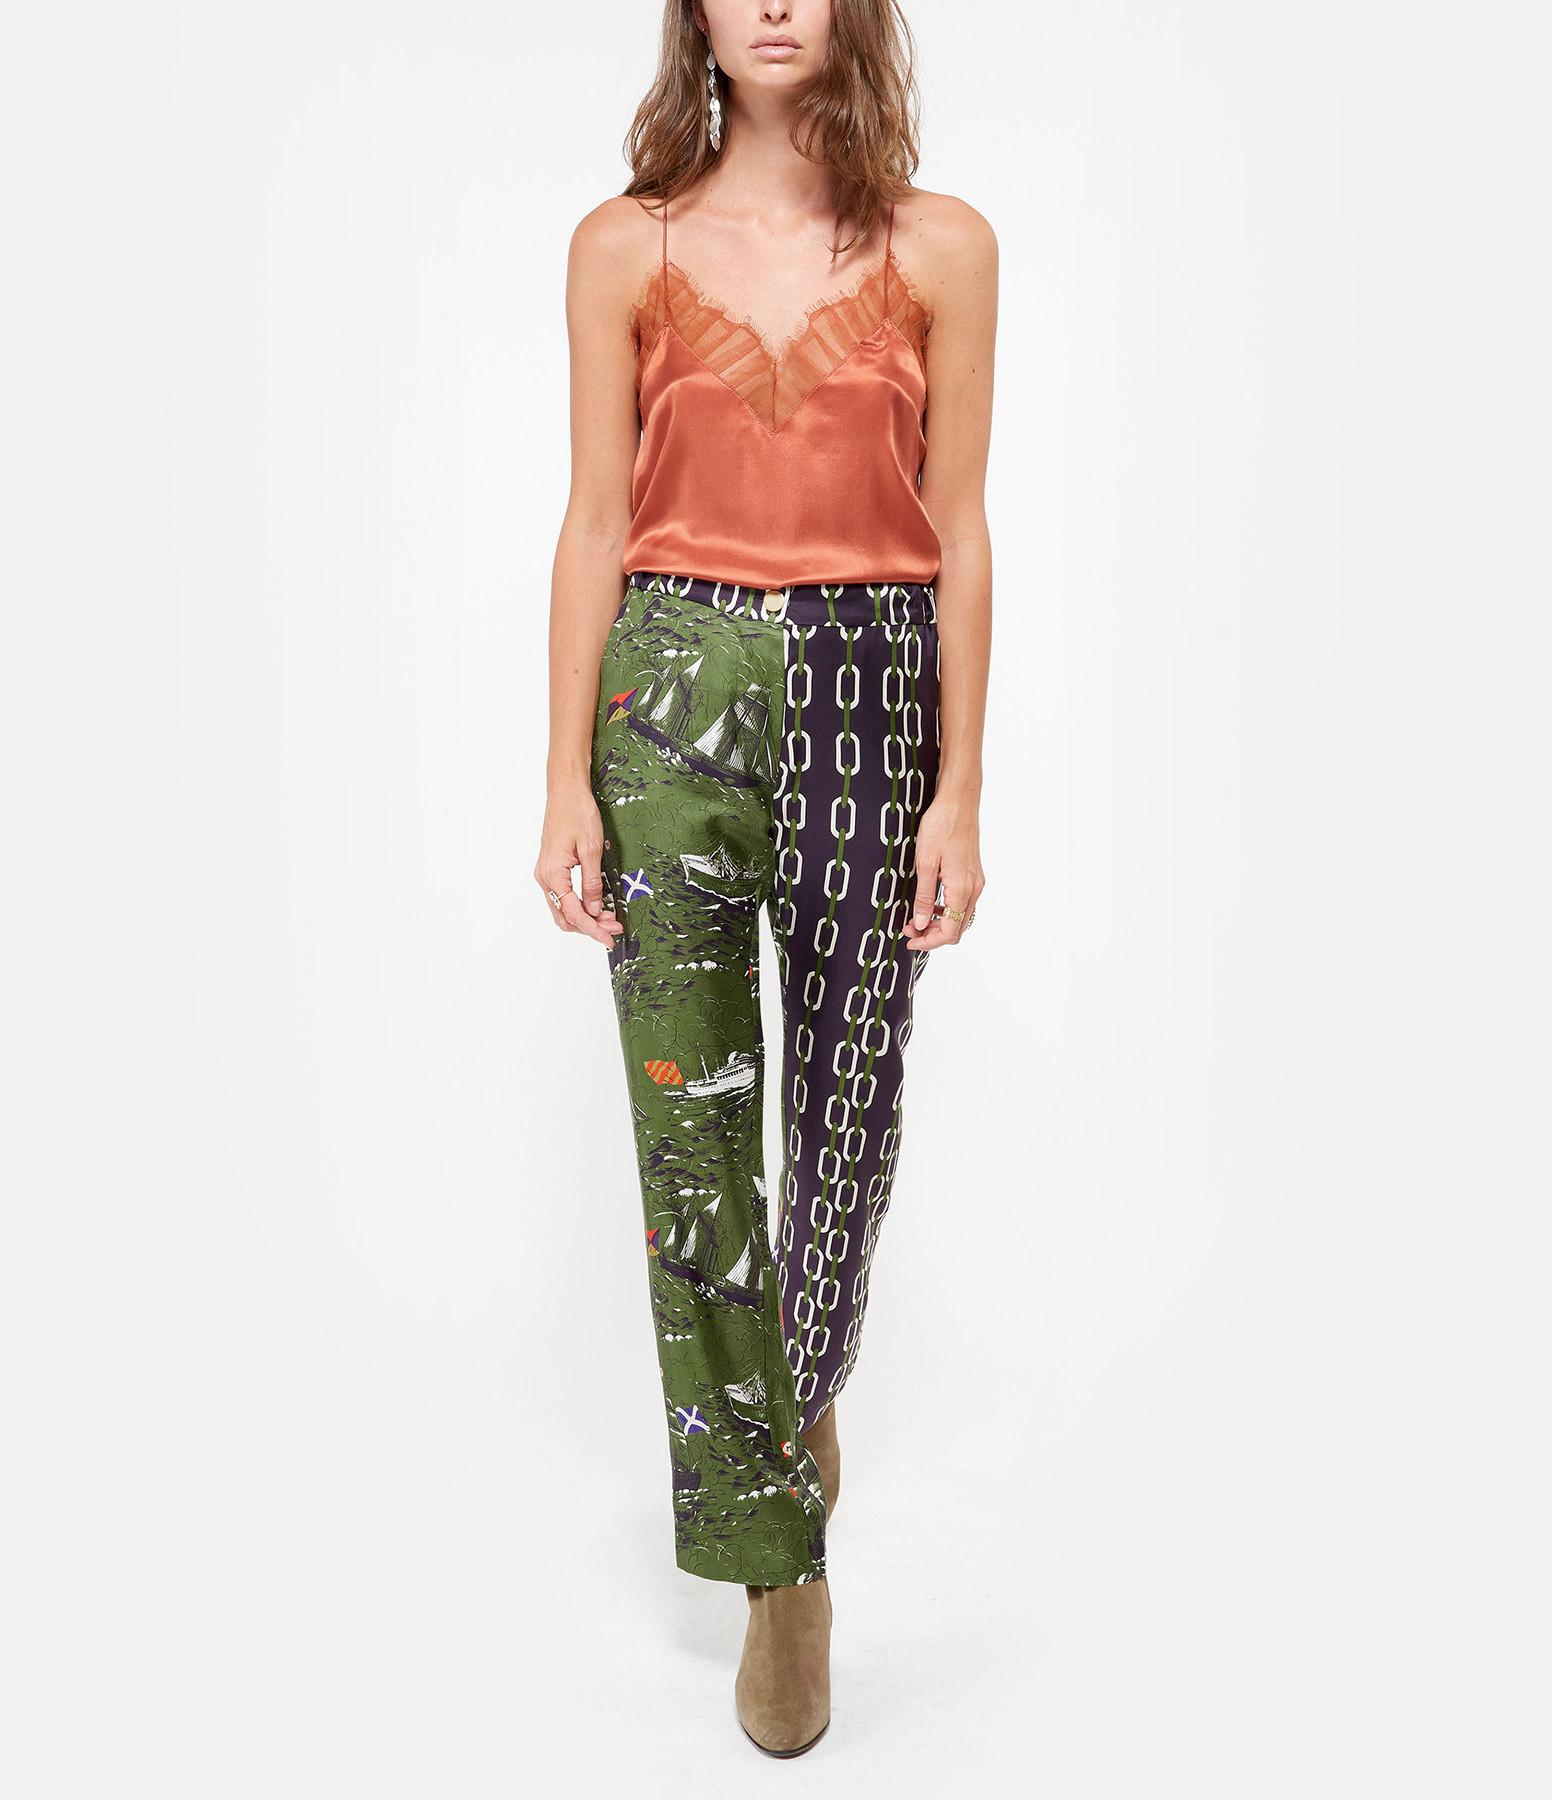 LA PRESTIC OUISTON - Pantalon Lucky Soie Vert Navire